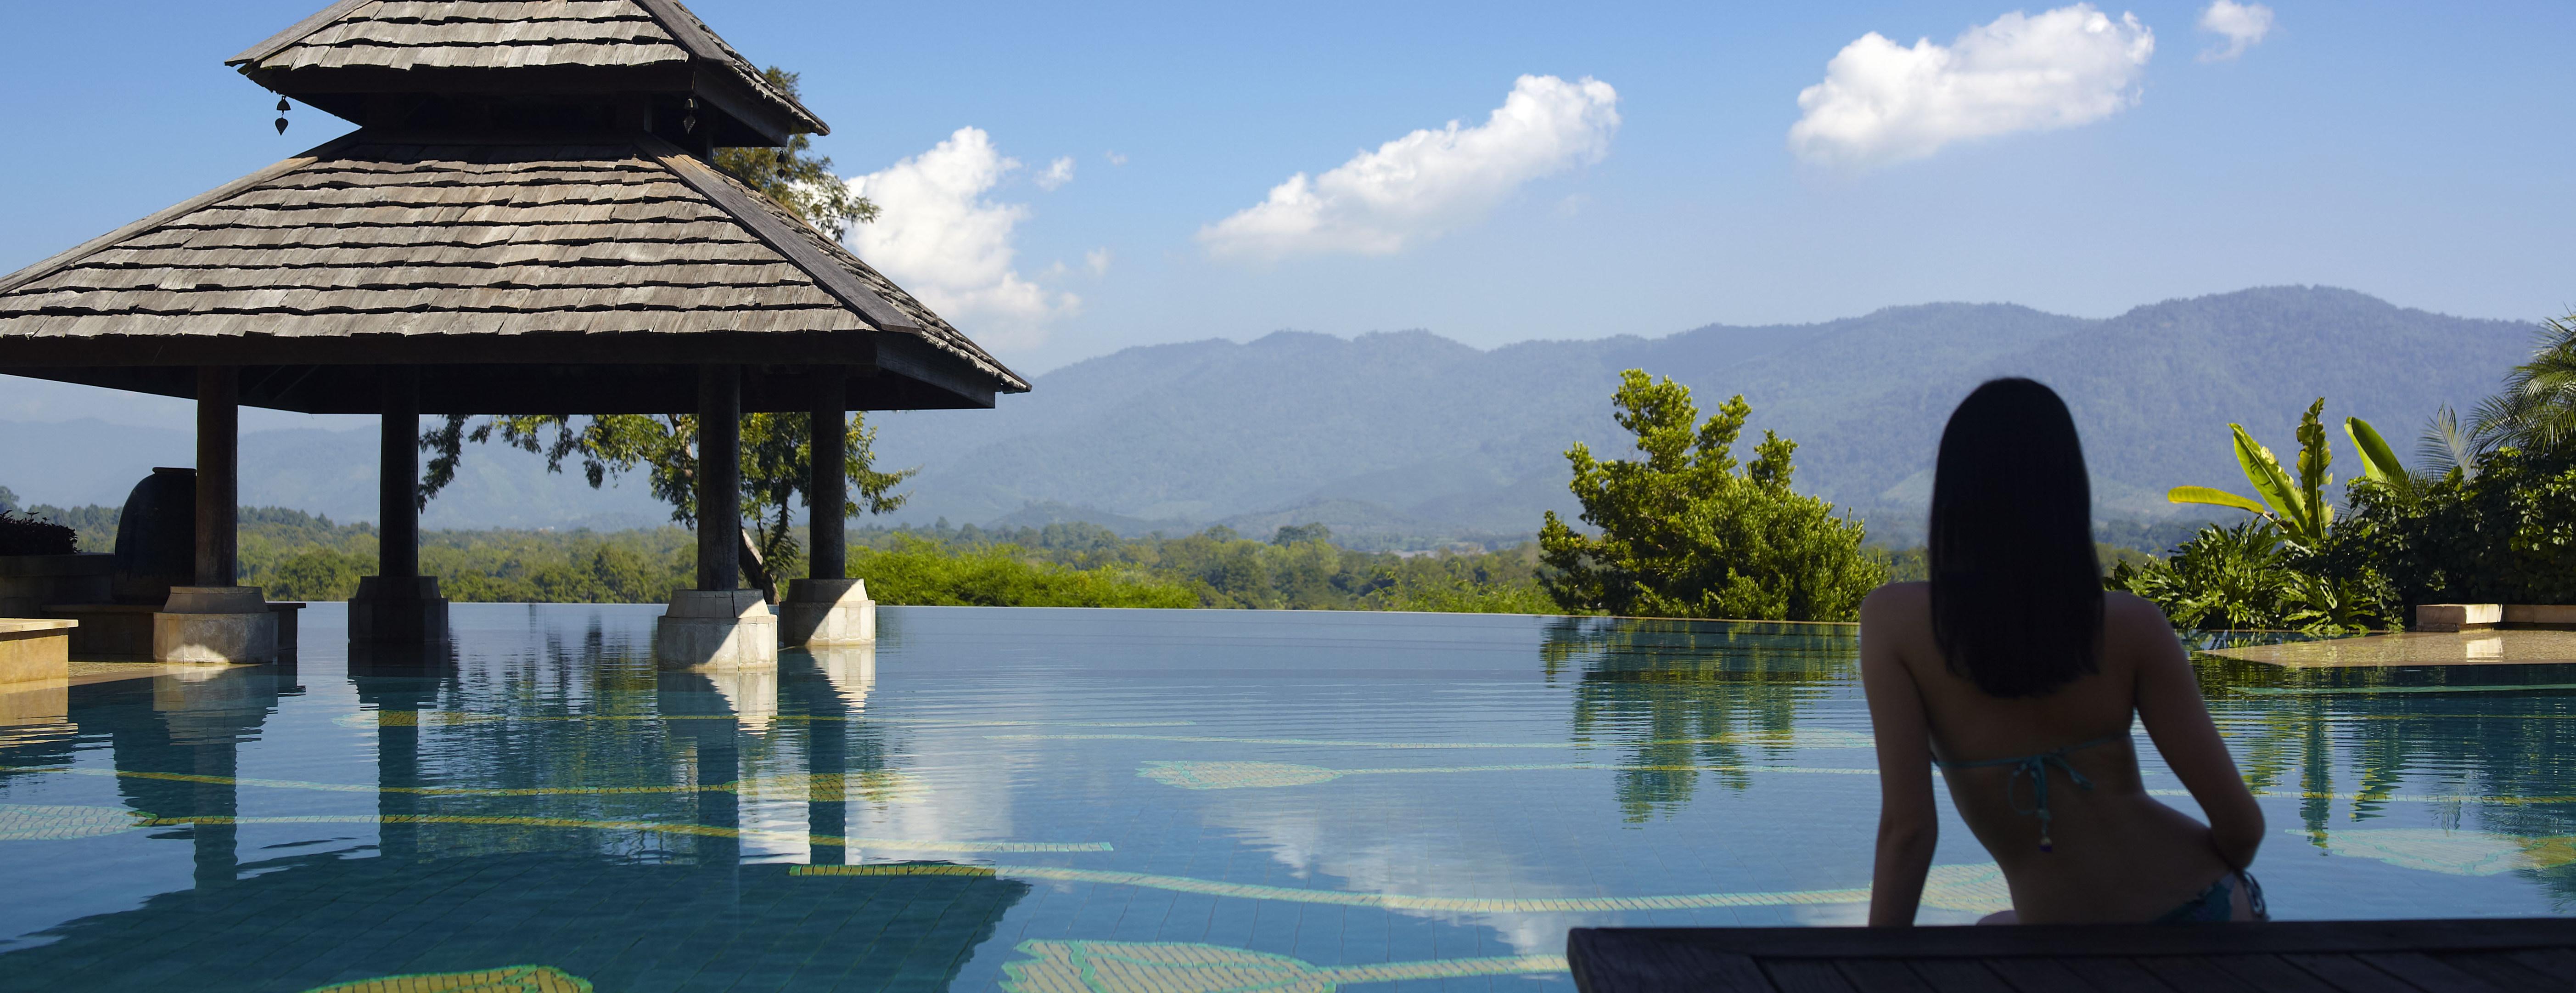 Mountain_view_across_pool